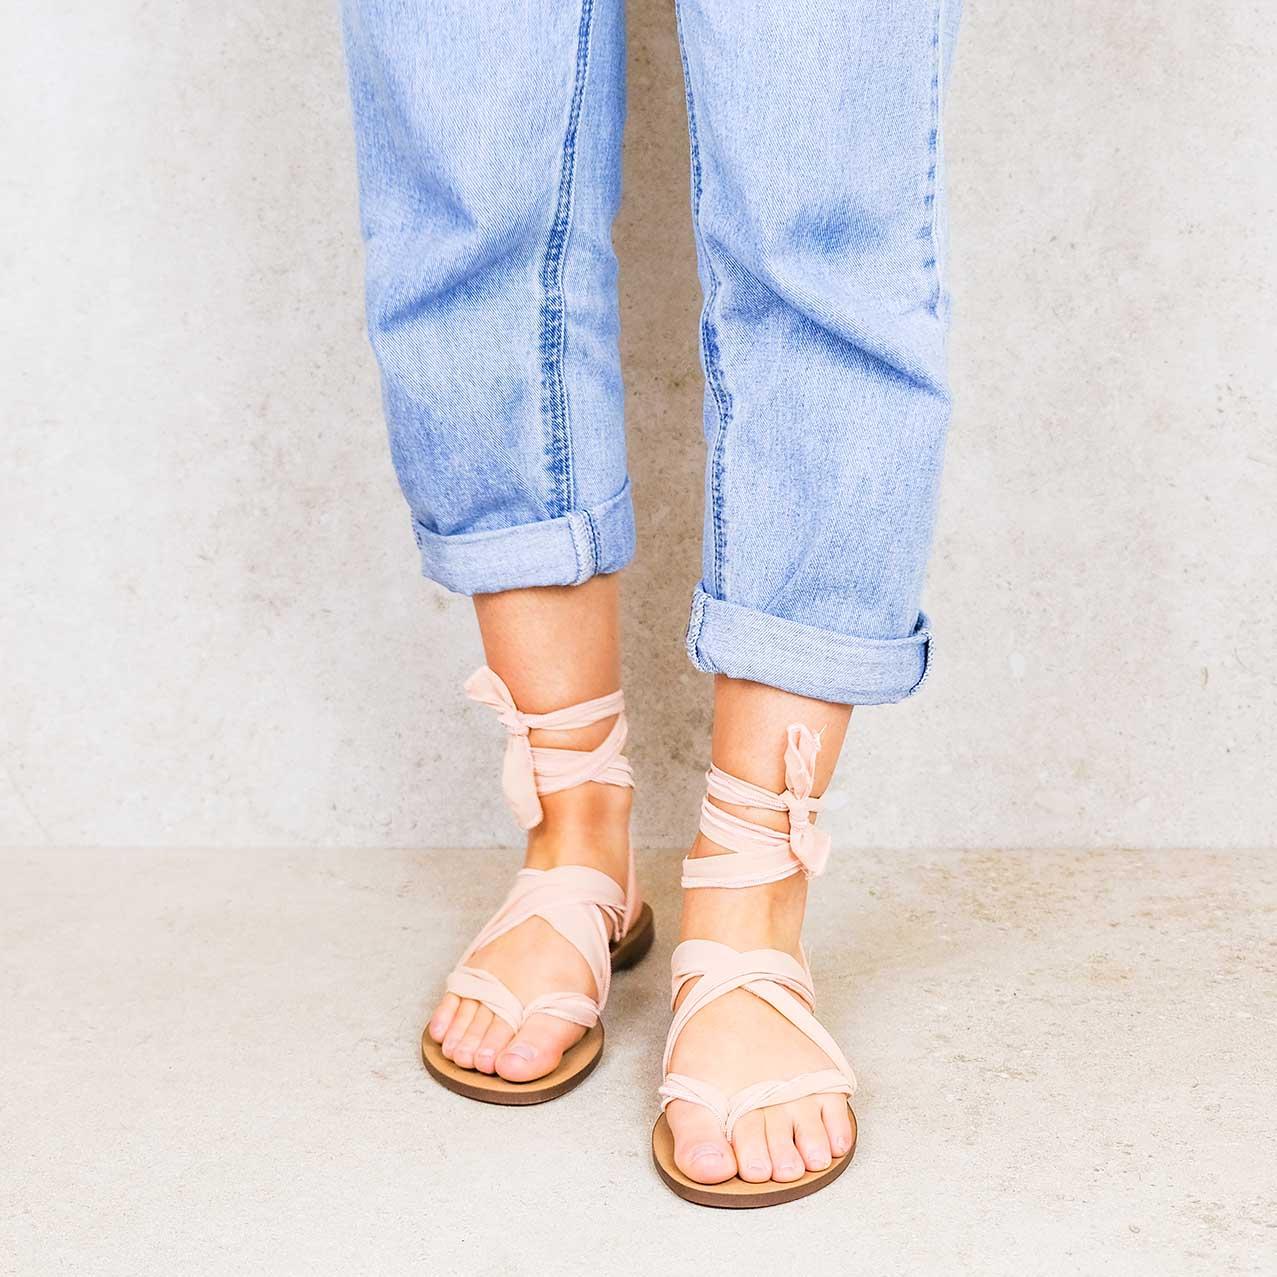 Dusty-pink_elegance ribbons linten lintsandalen sandals travelsandals vegan sustainable sandals wikkelsandalen